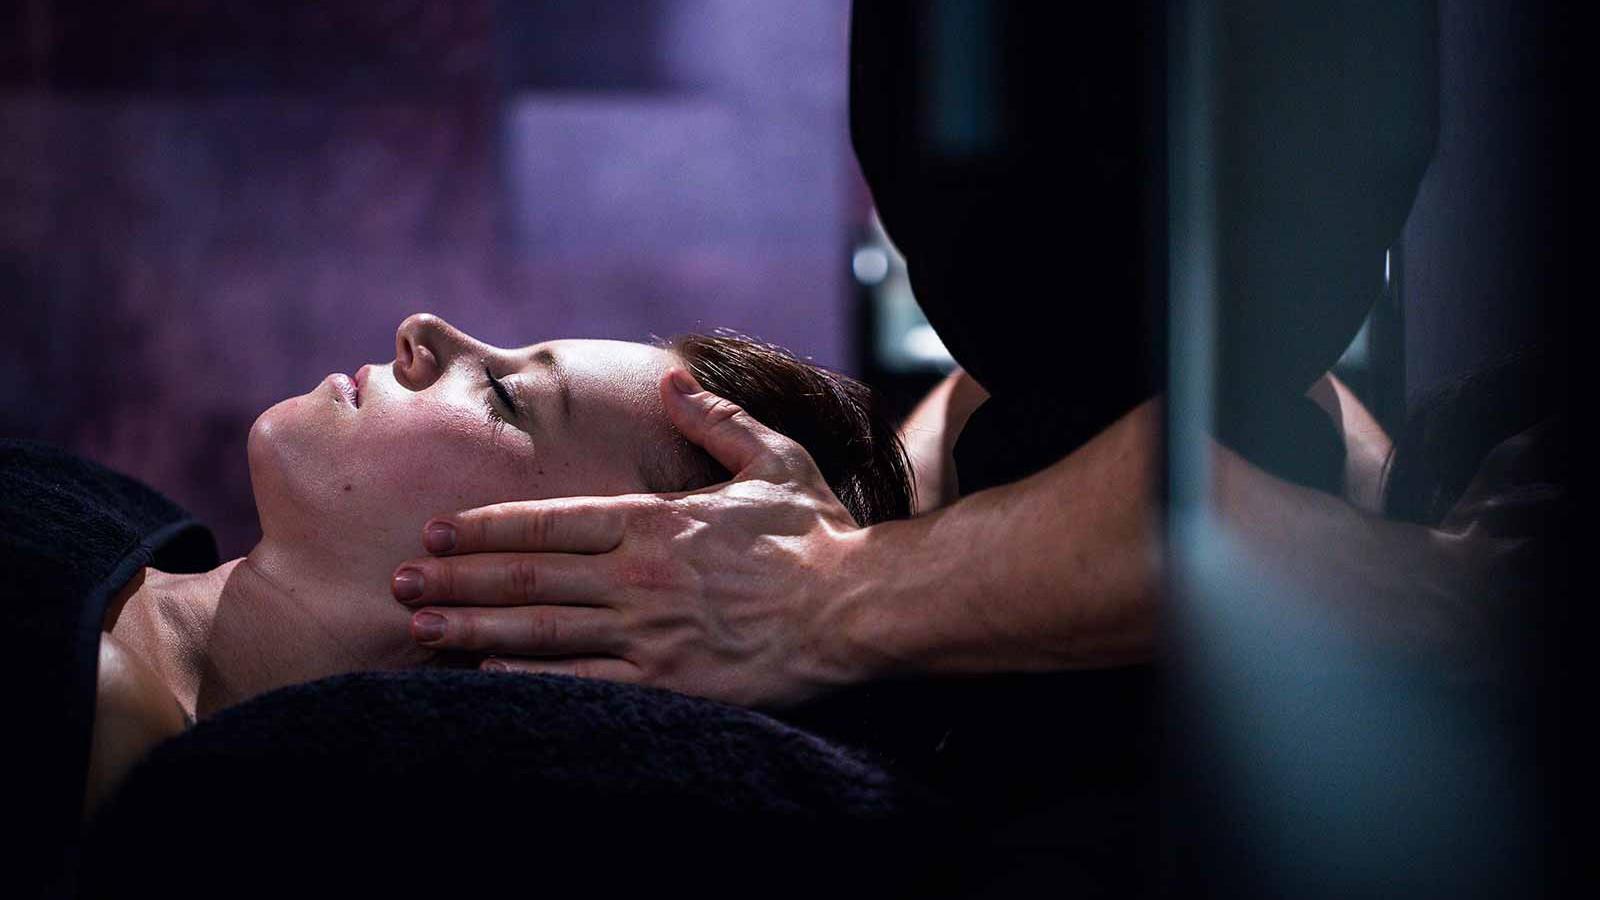 Daria-I Nor Hotel, Alpe D'Huez - Massage